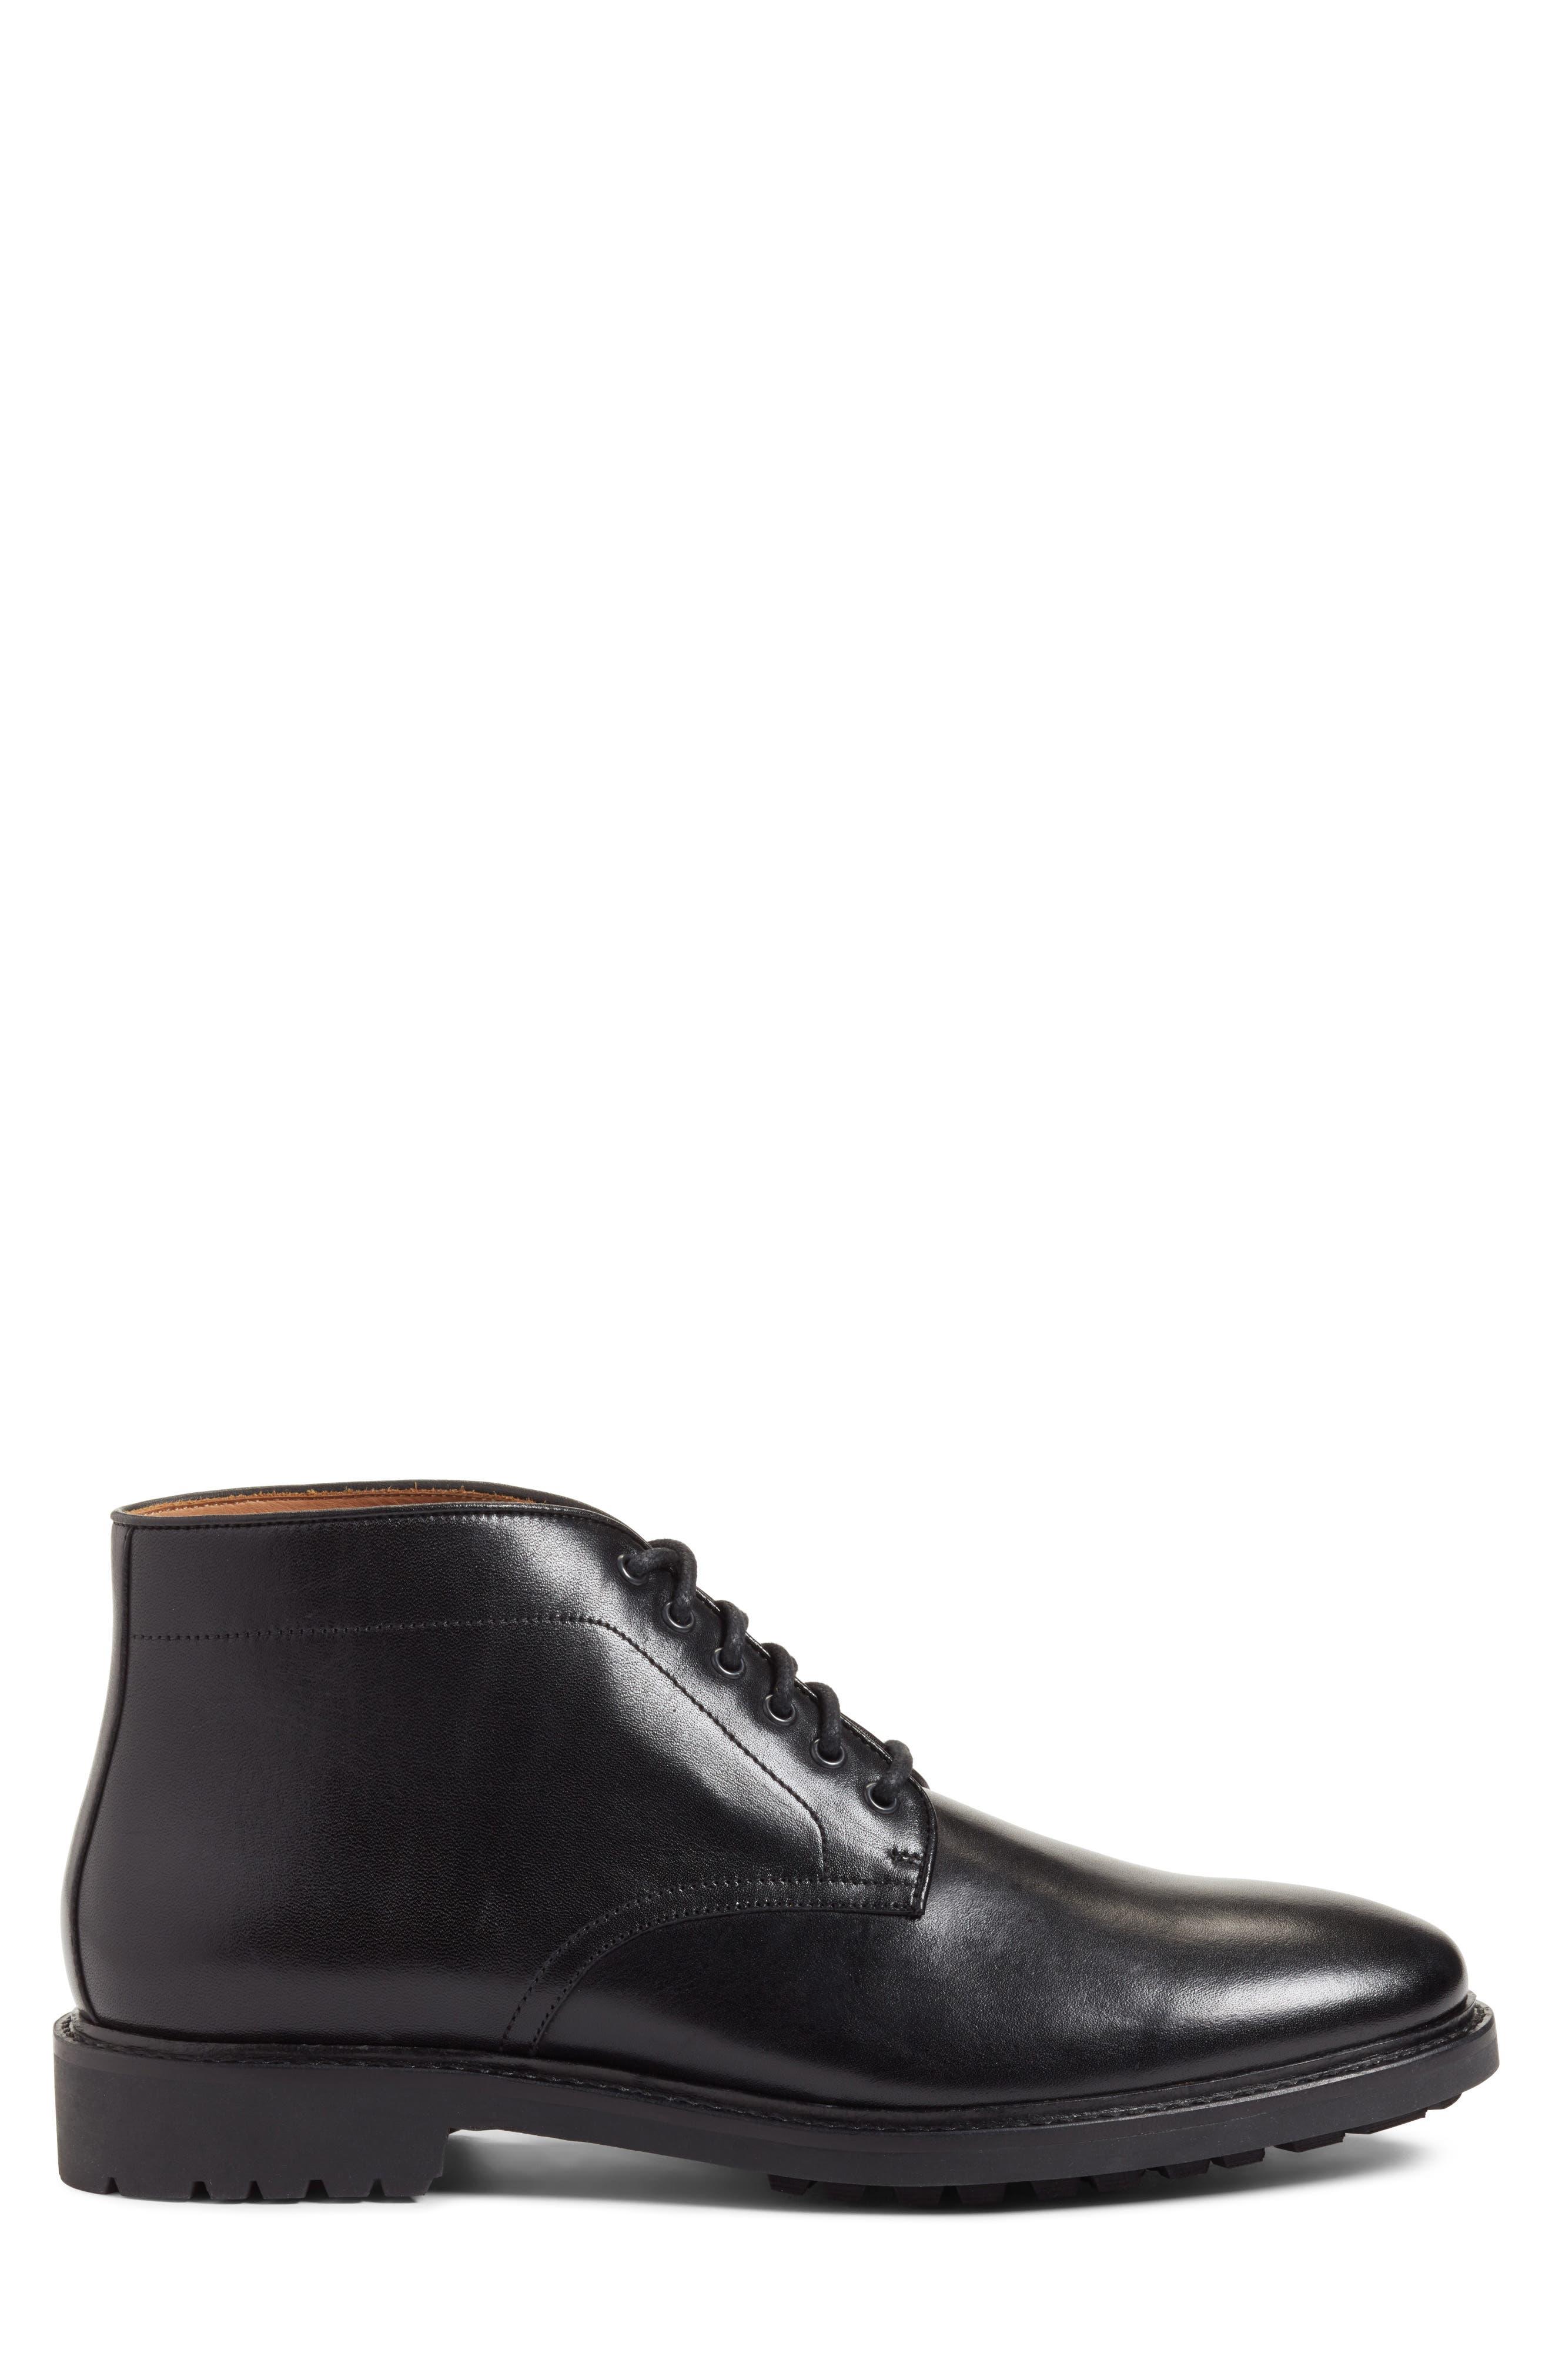 Alternate Image 3  - John W. Nordstrom® Ramiro Plain Toe Boot (Men)